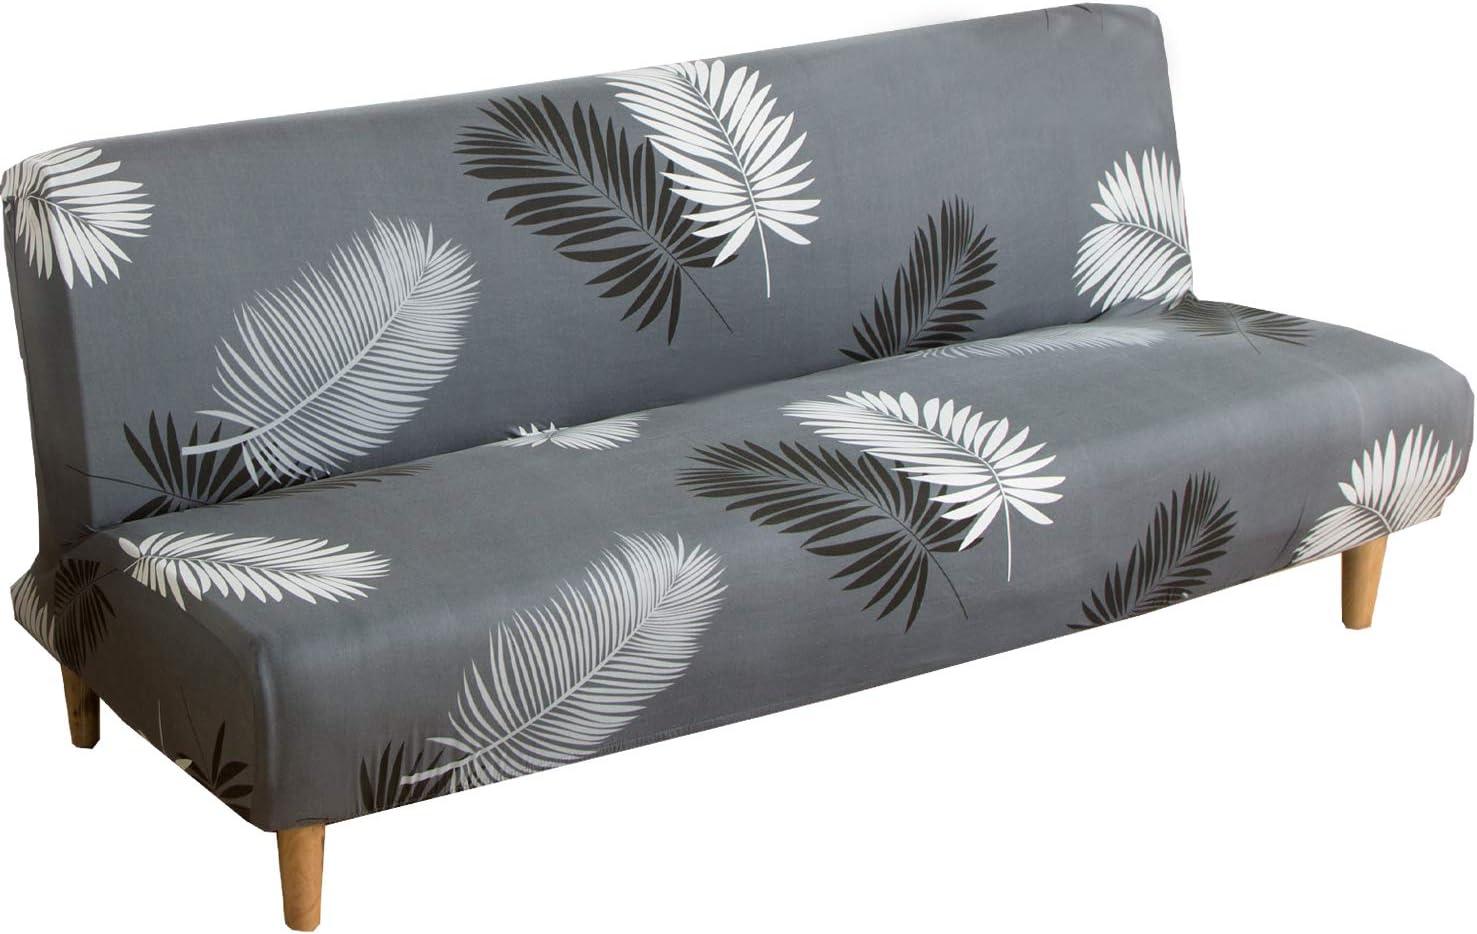 Meicynhoger Funda para sofá cama sin brazos, funda elástica para sofá cama plegable de 2 plazas/3 plazas sin reposabrazos (L,A)